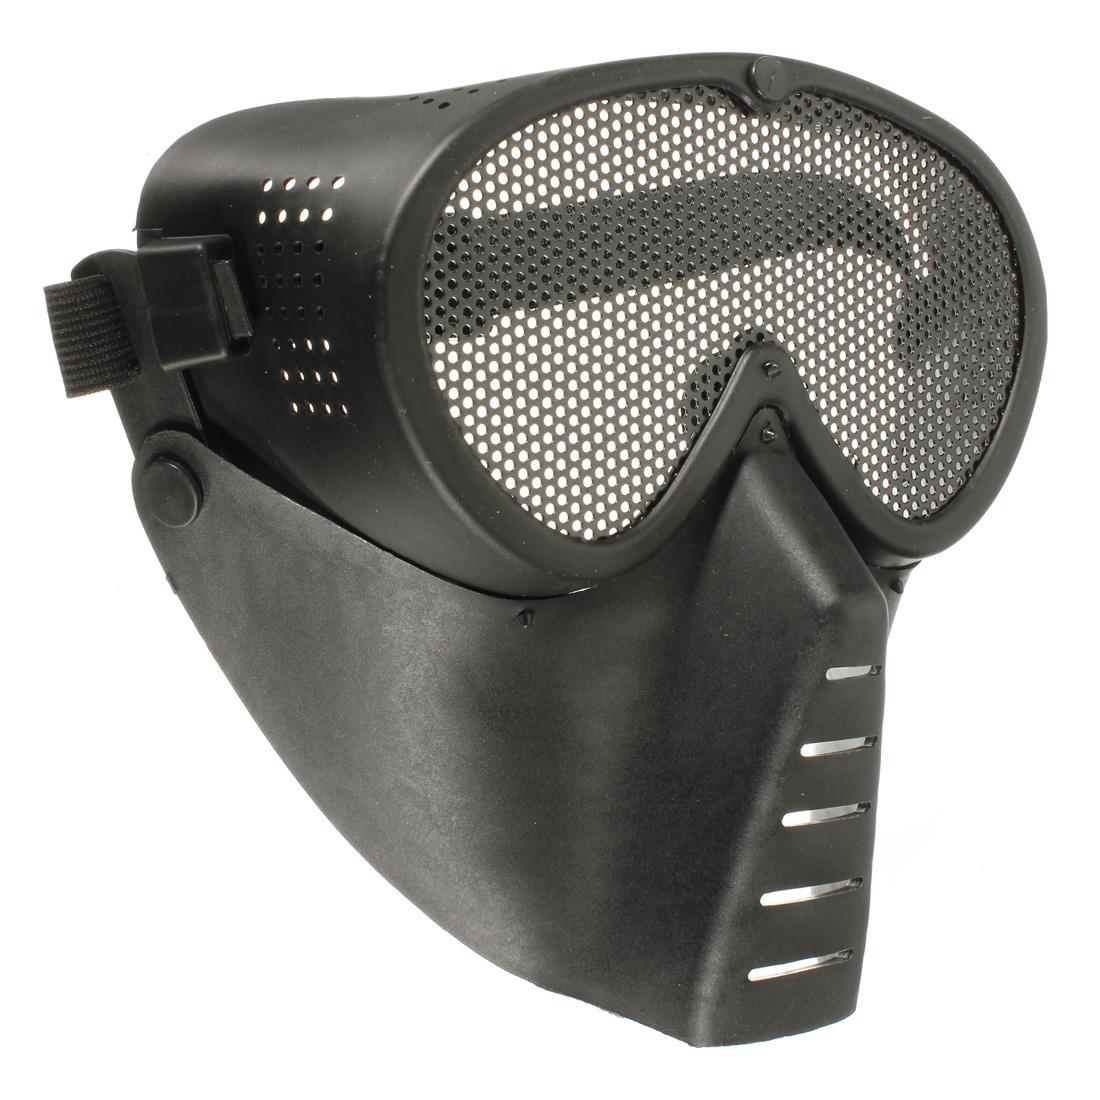 Atv dust mask 10